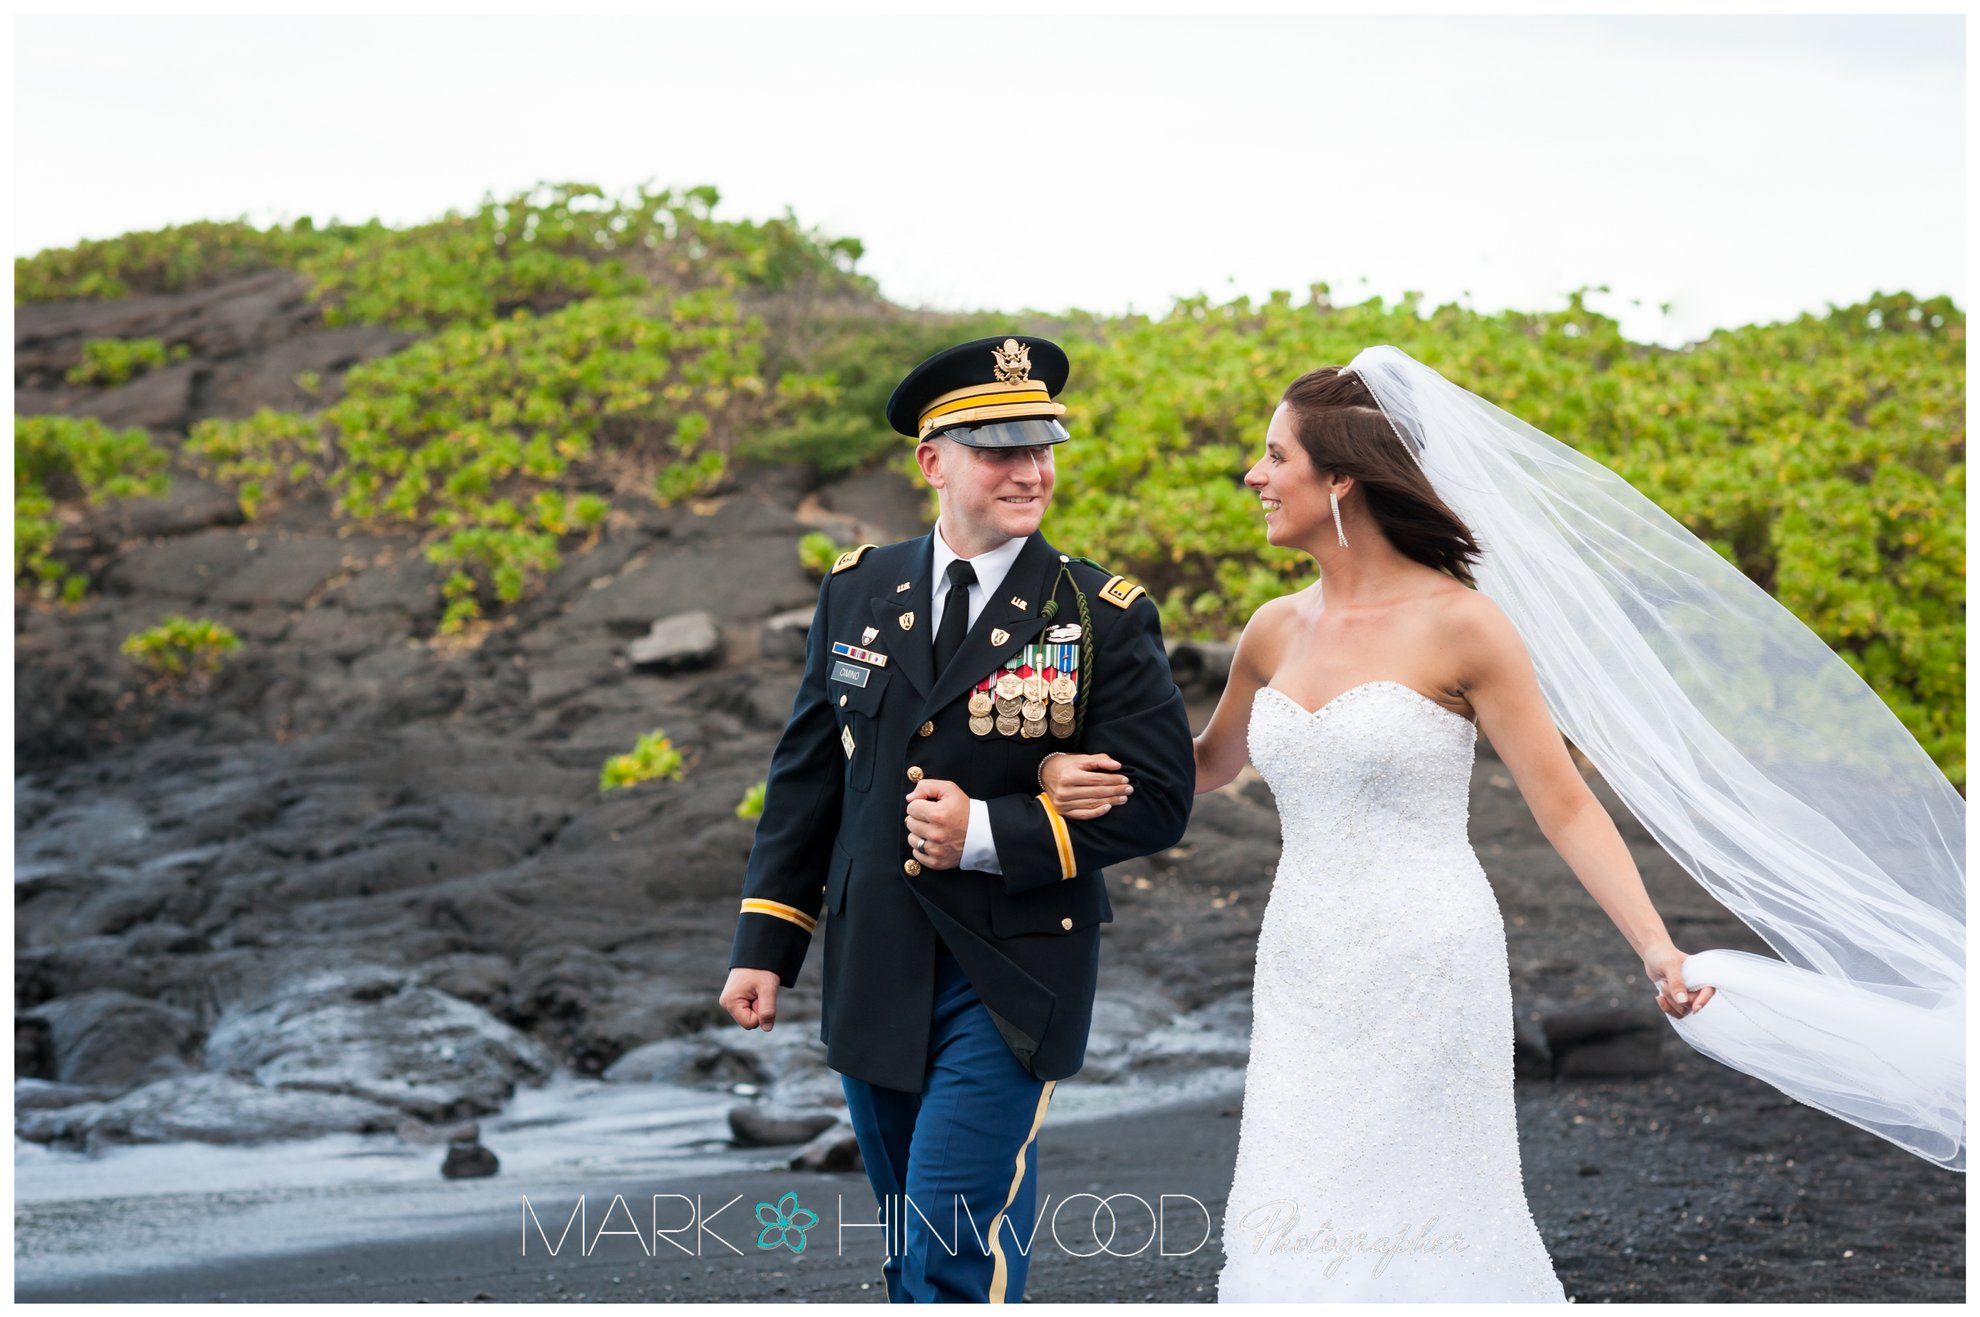 Engagement photography Big Island Hawaii 2